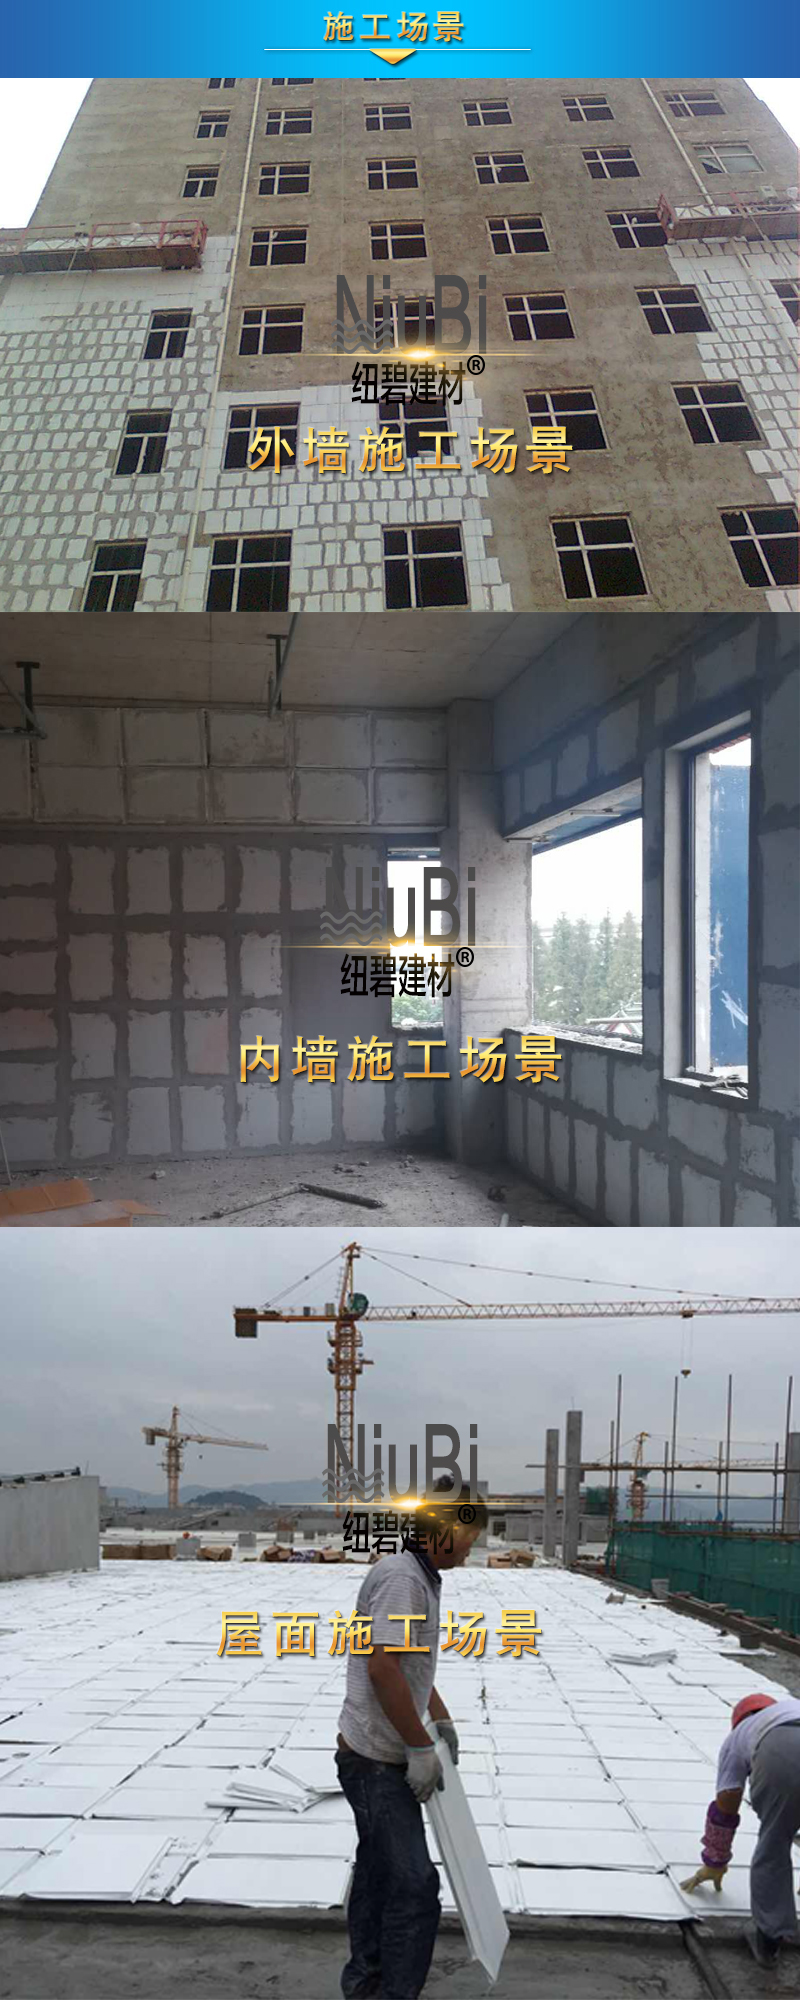 stp真空保温板施工场景图